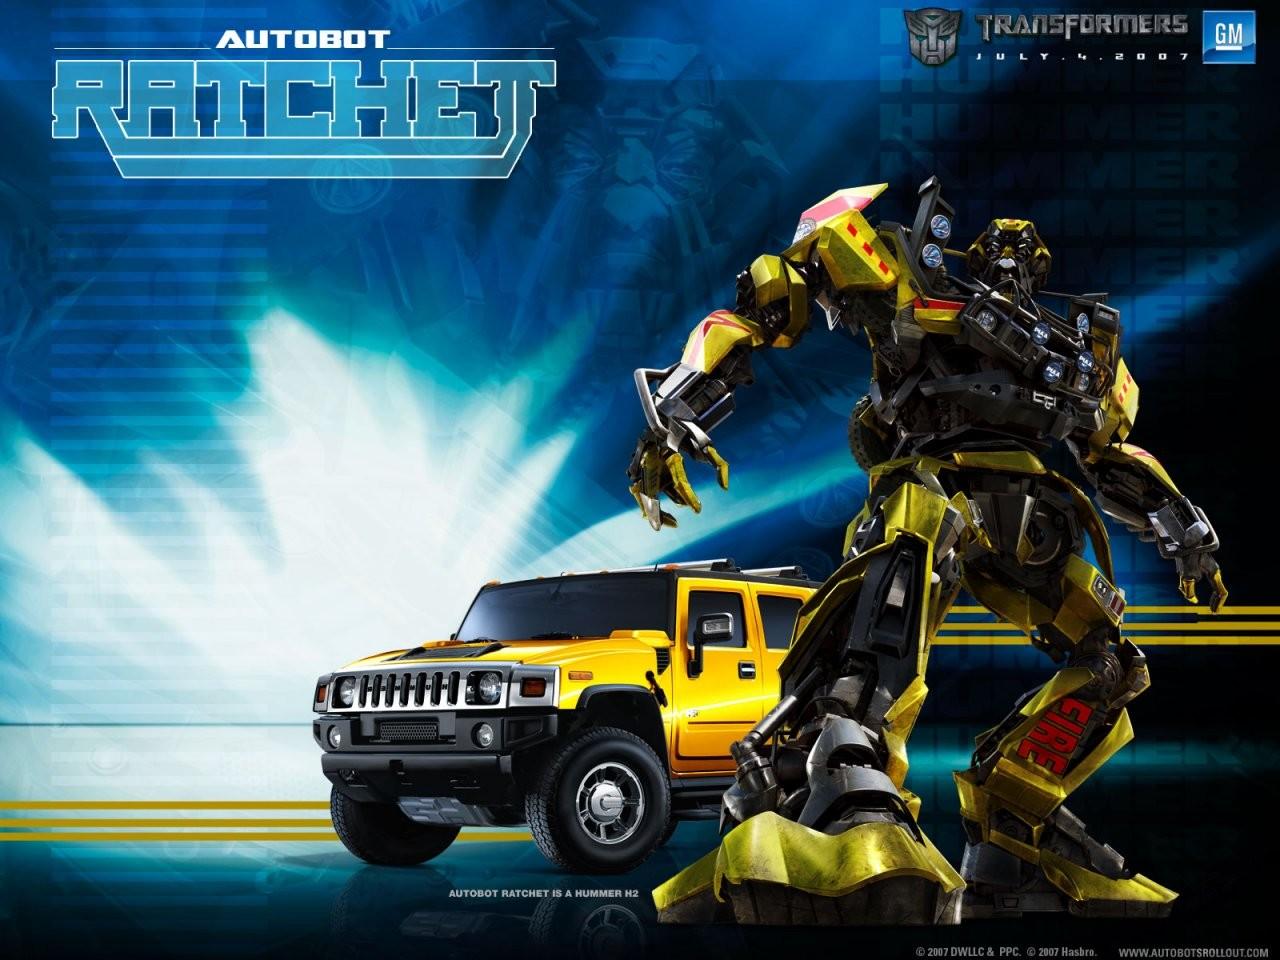 Transformers Wallpaper Top HD Wallpapers 1280x960